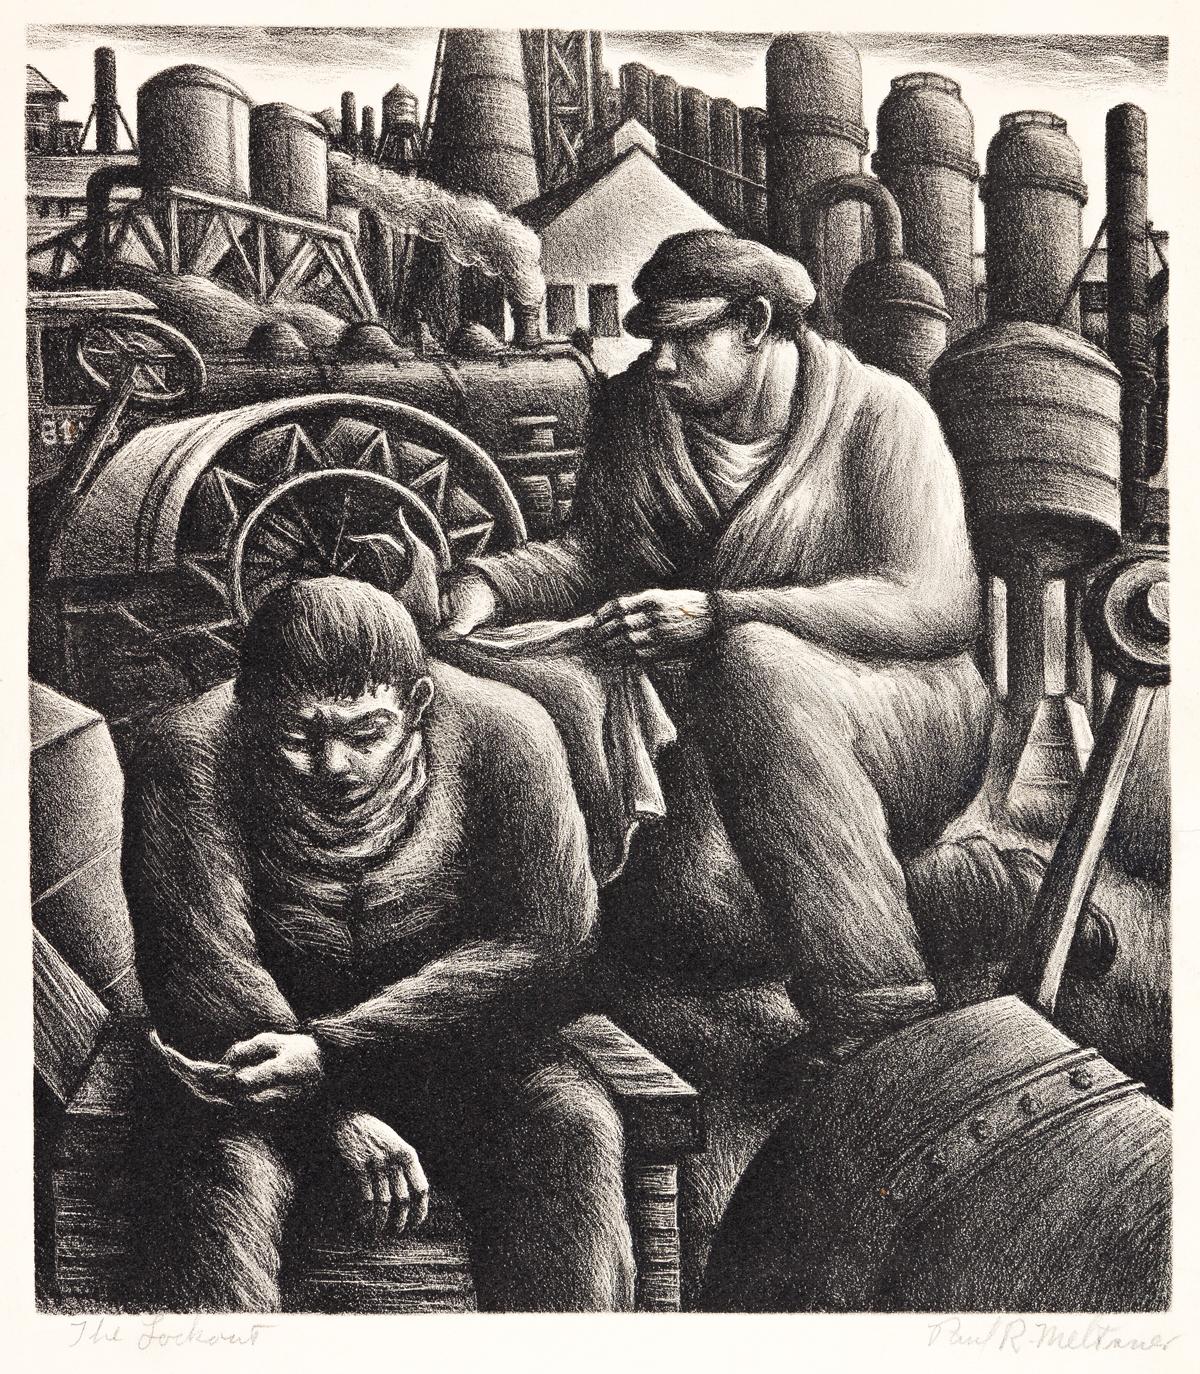 PAUL MELTSNER (1905-1967) The Lockout.